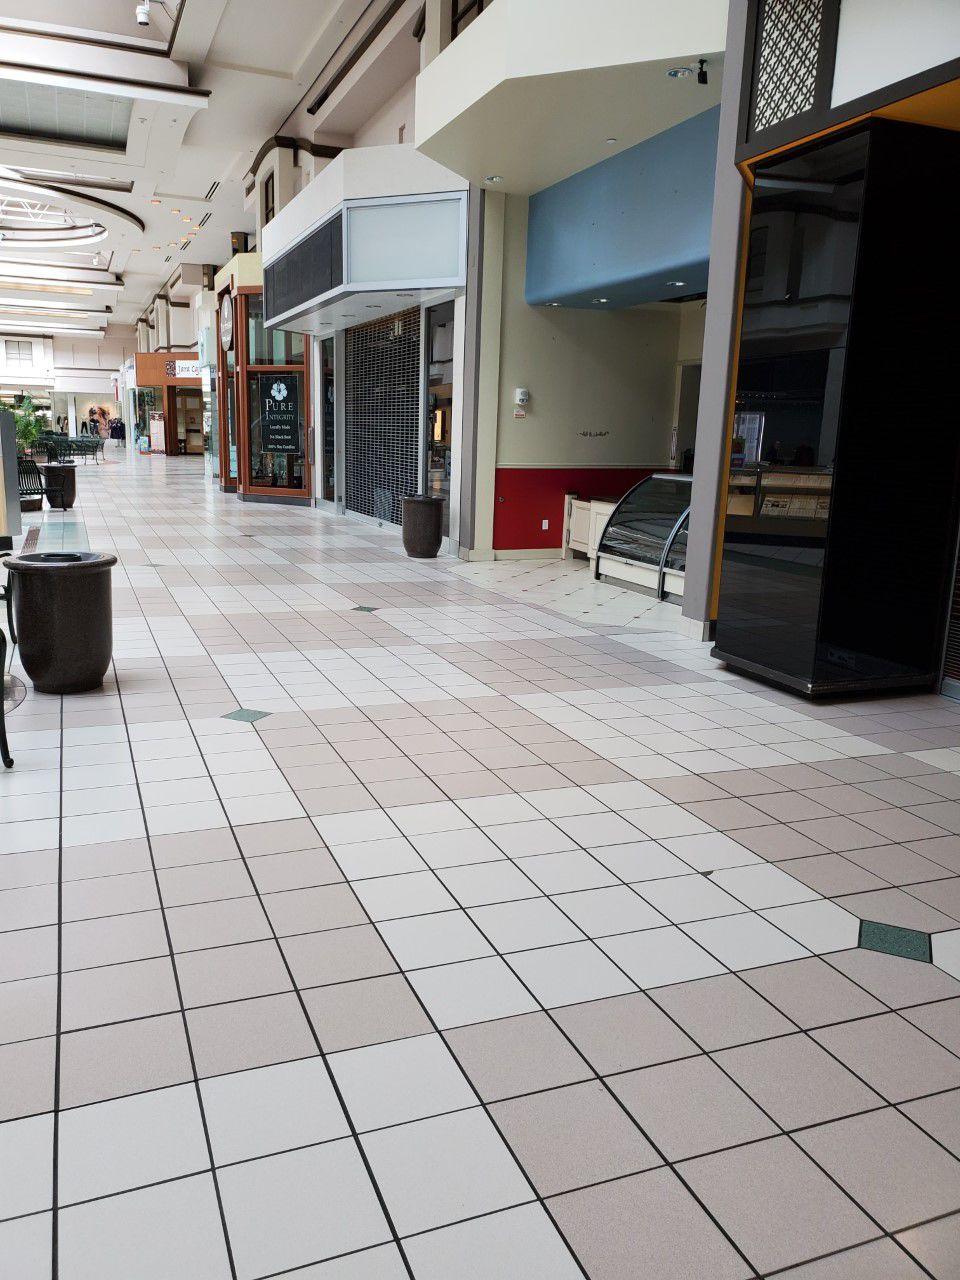 Boulevard Mall Buffalo : boulevard, buffalo, Malls, Close,, Shopping, Least, Business, Local, Buffalonews.com